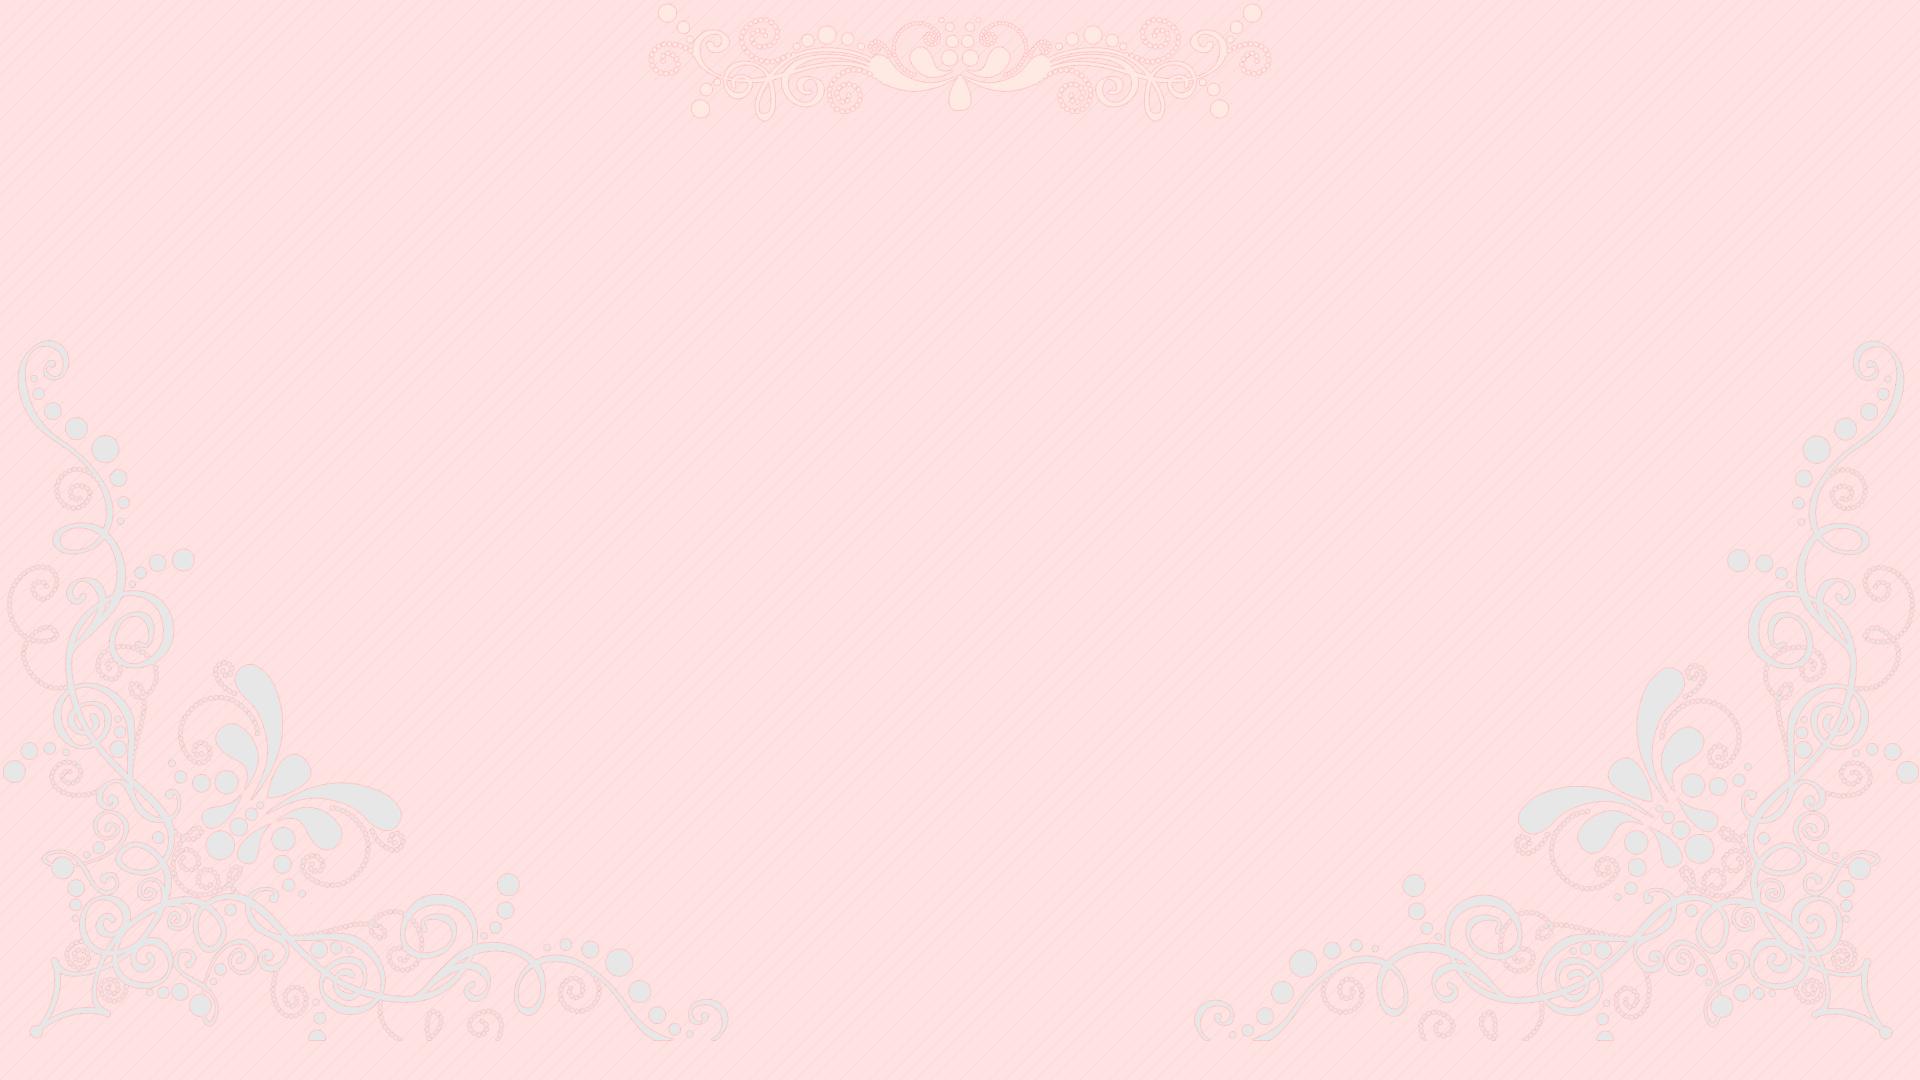 pastel desktop wallpaper - photo #7